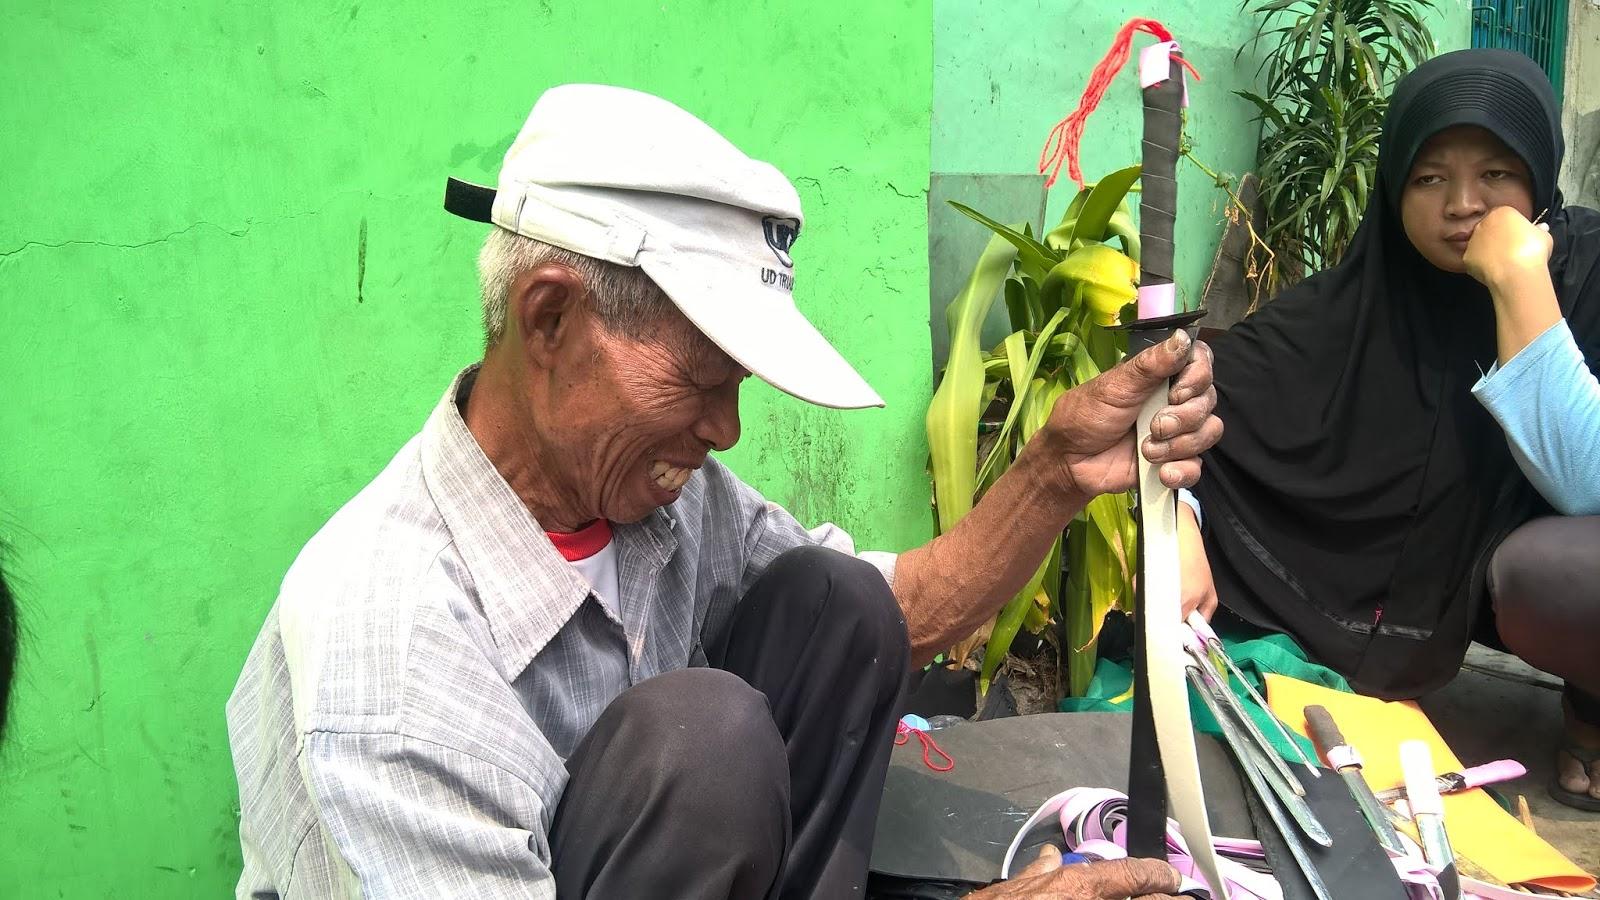 Kakek Penjual Mainan Pedang dari Bambu